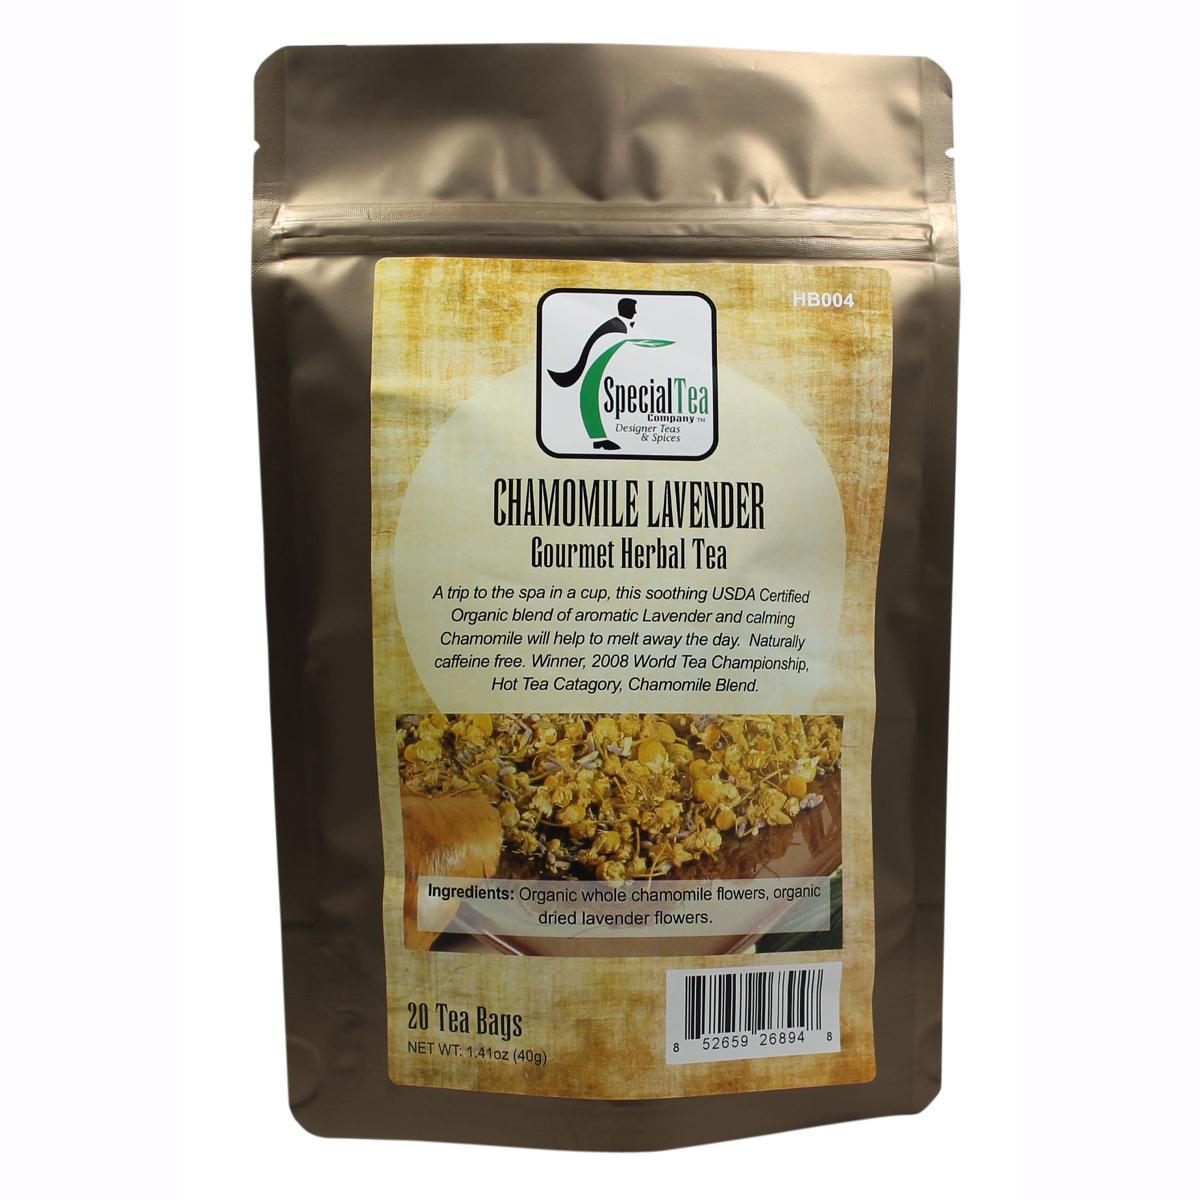 Blend gourmet herbal tea - Chamomile Lavender Organic Tea